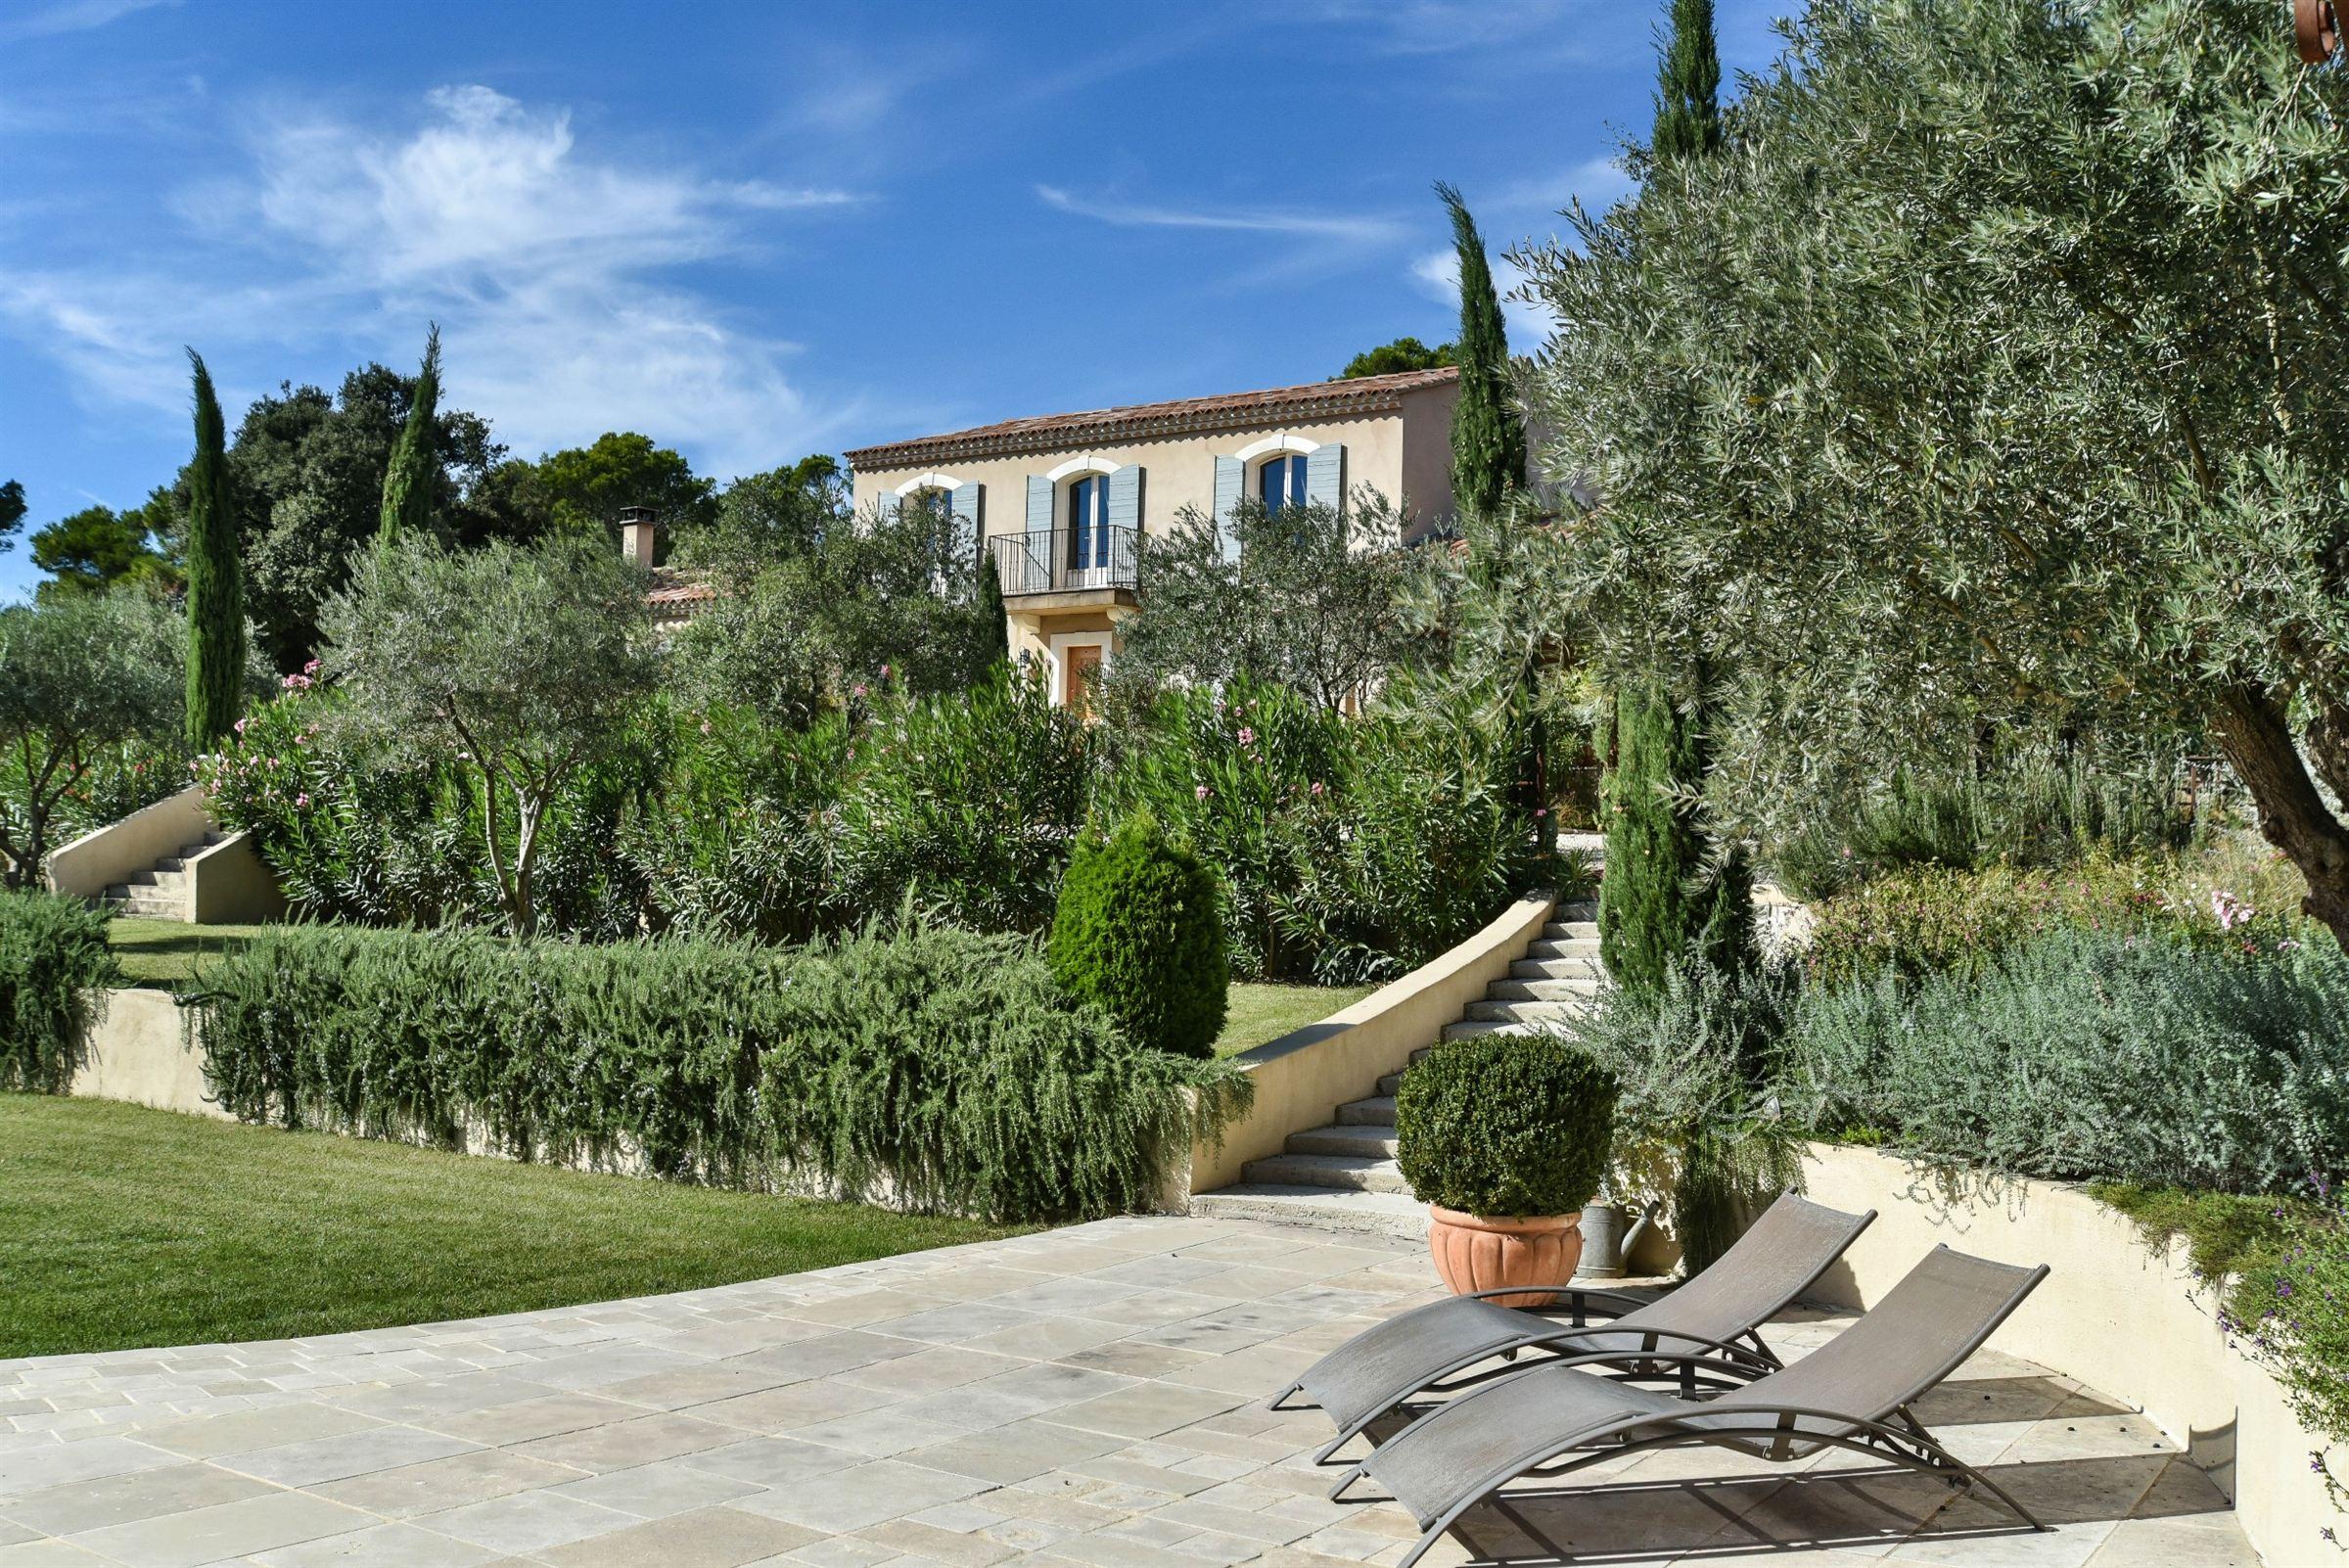 Moradia para Venda às A guest house on sale Other Provence-Alpes-Cote D'Azur, Provença-Alpes-Costa Azul, 84290 França